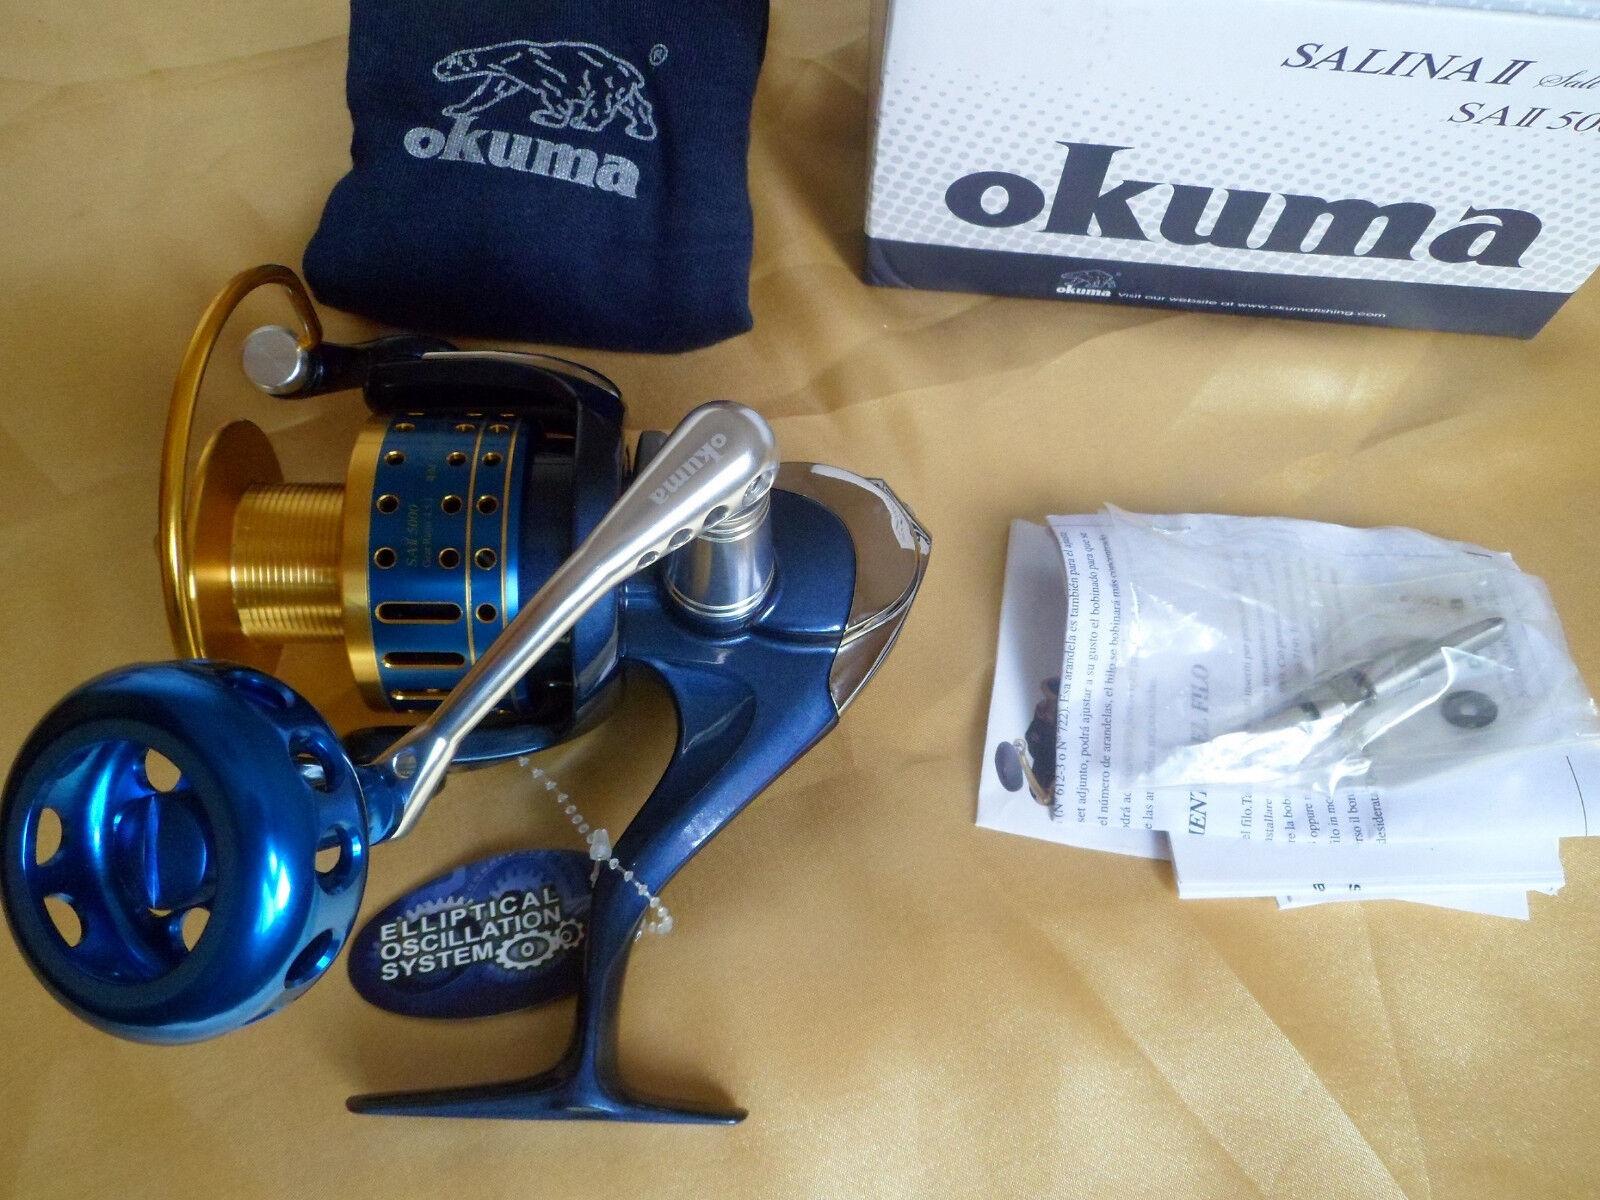 Okuma SALINA II 5000 Saltwater Spinning Reel  23kg drag